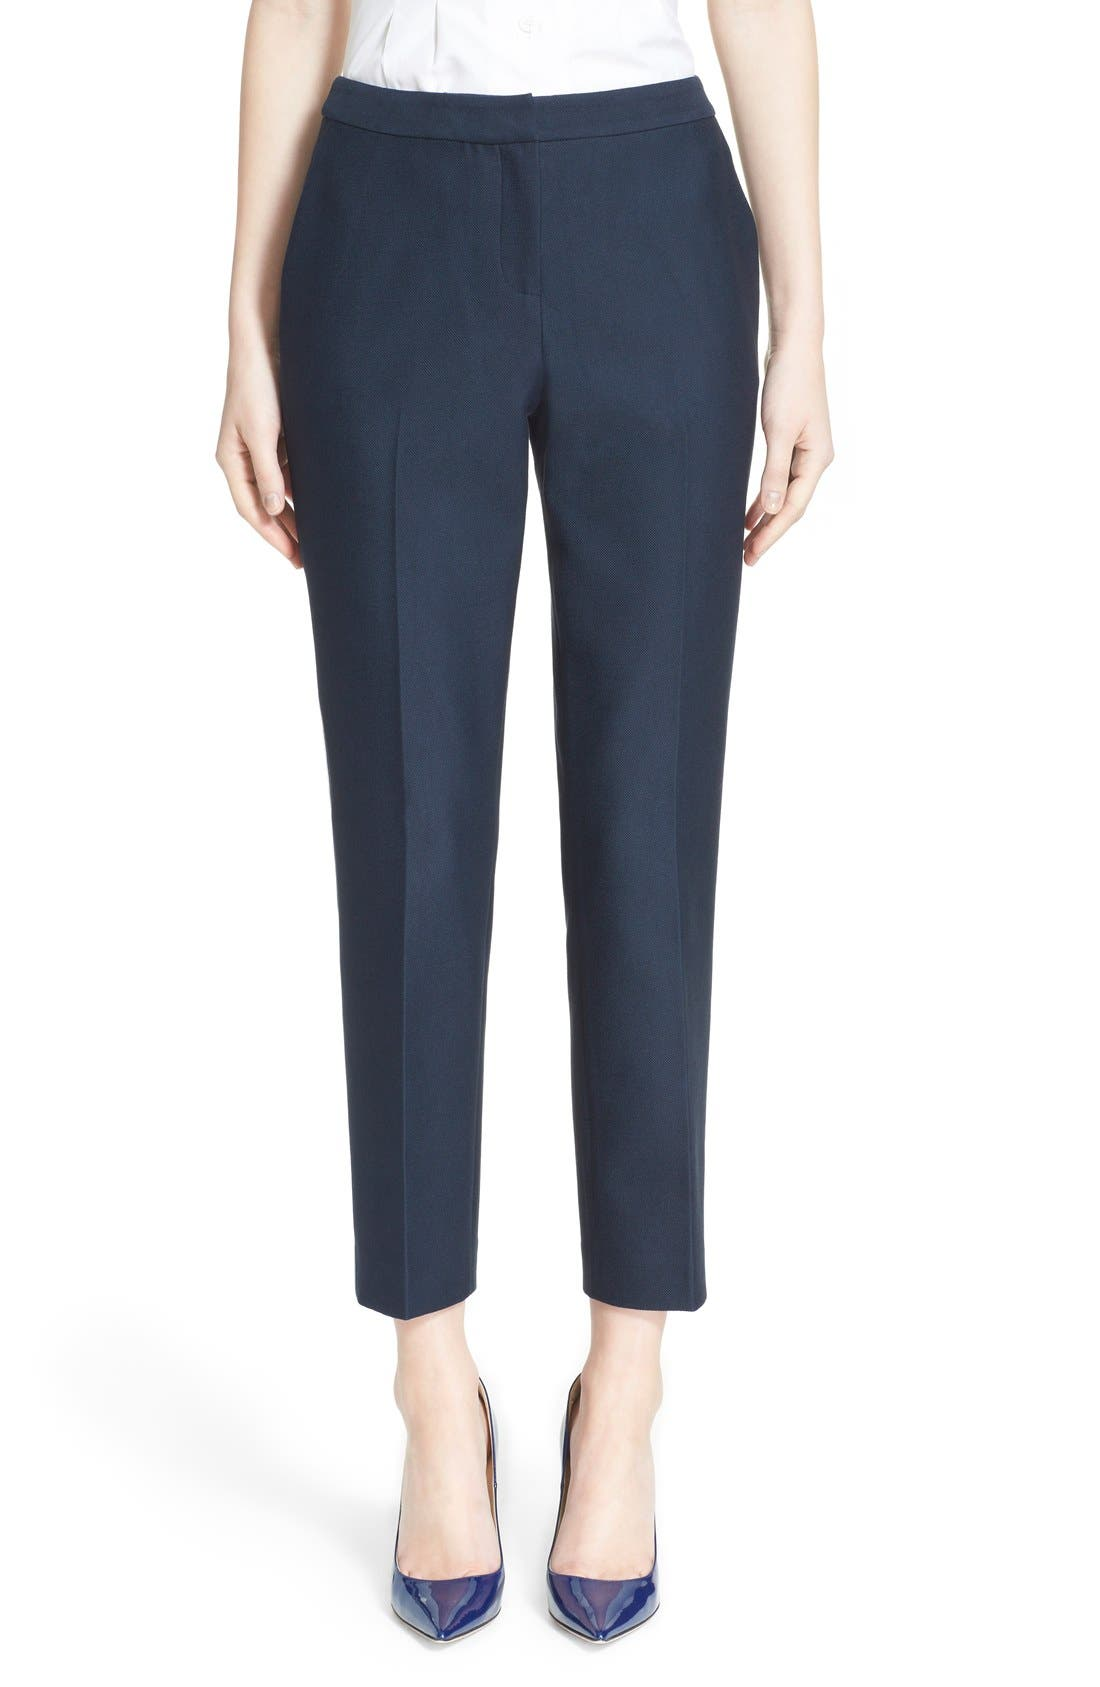 Main Image - Nordstrom Signature and Caroline Issa 'Raindrop' Slim Cotton Ankle Pants